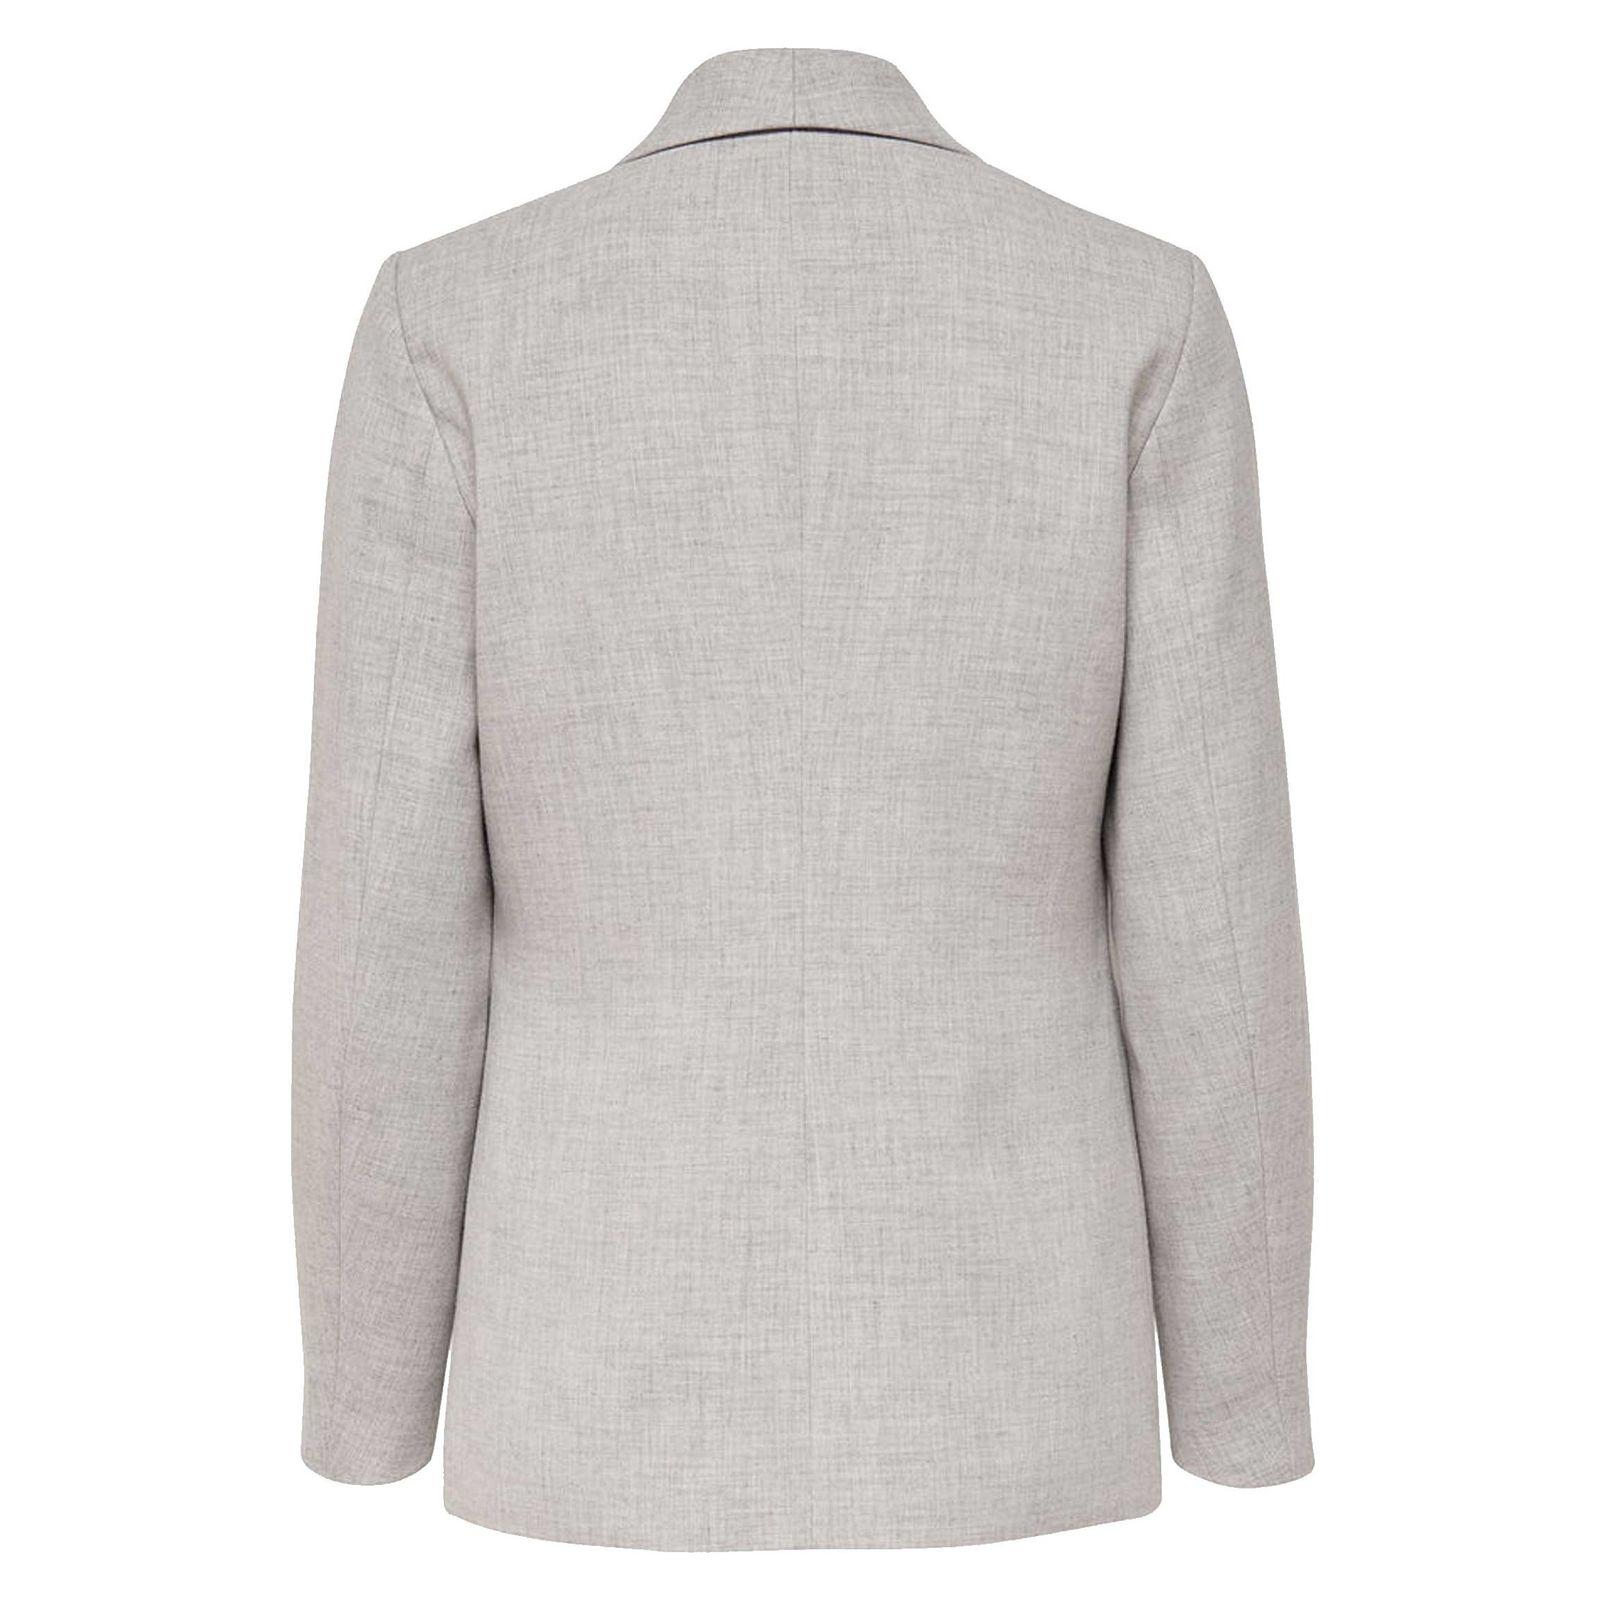 کت کوتاه زنانه - اونلی - طوسي - 2